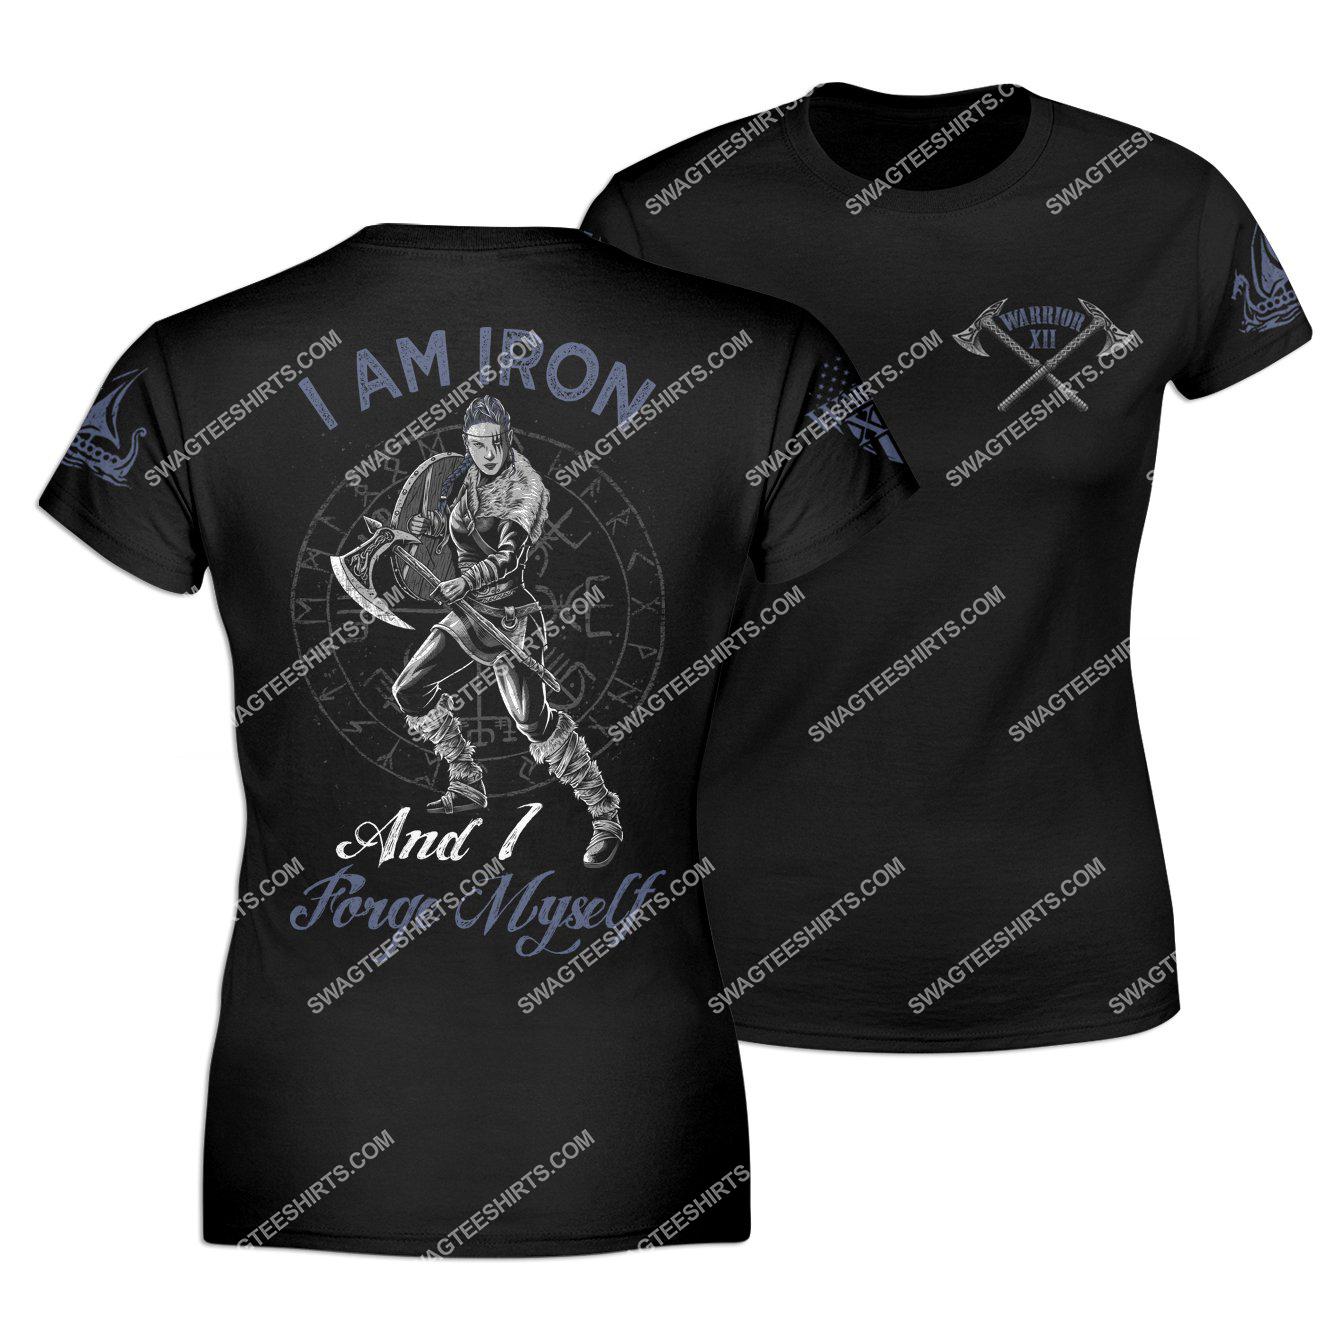 i am iron and i forge myself viking warrior shirt 1 - Copy (2)